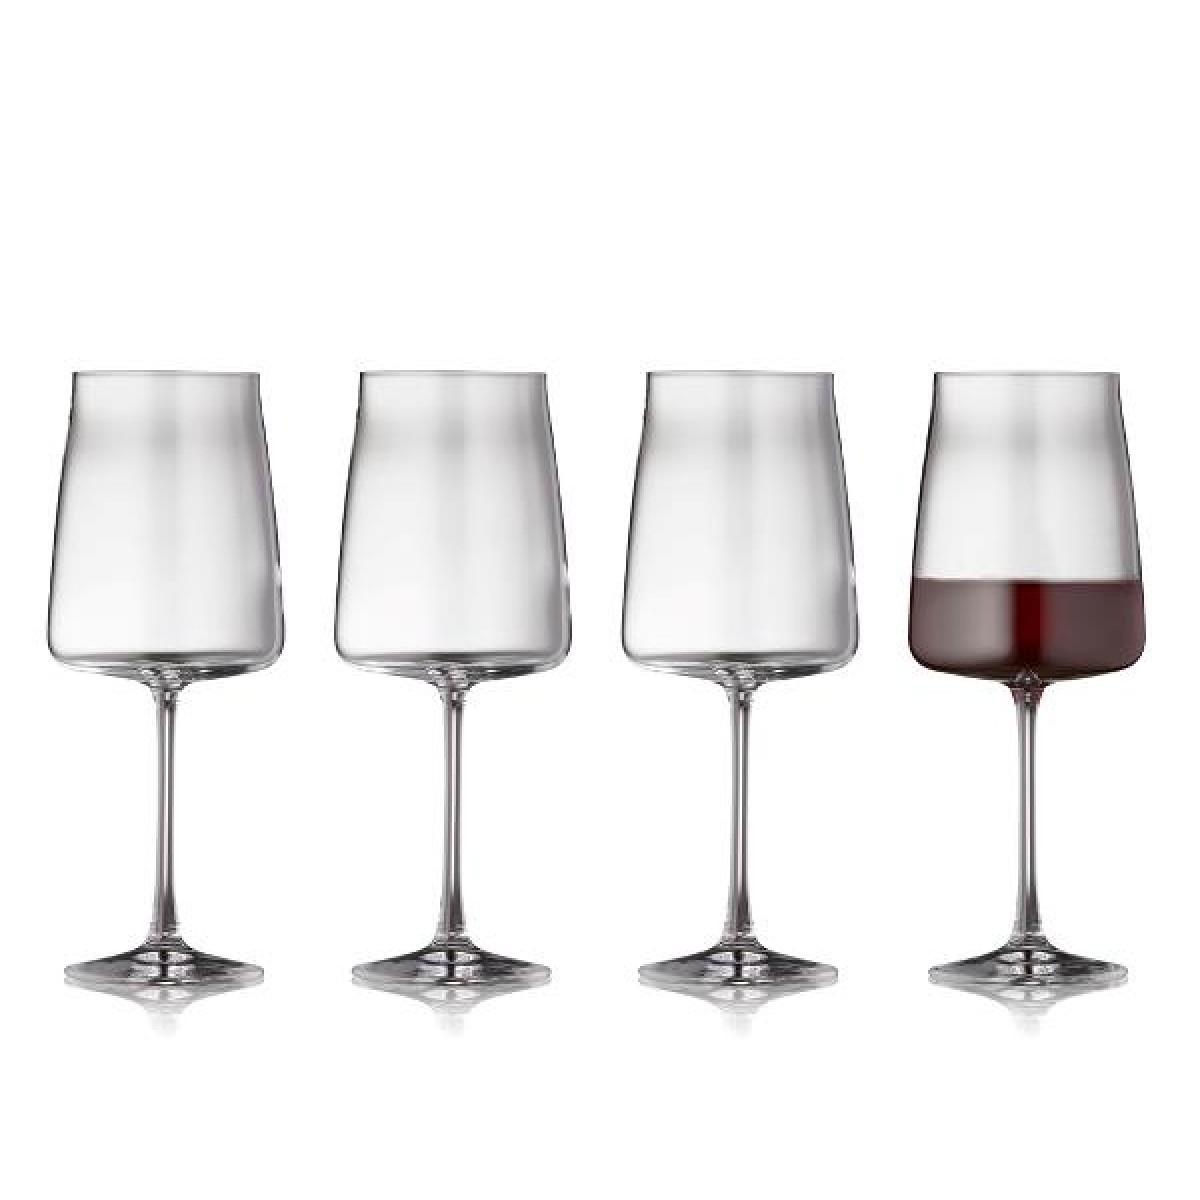 LYNGBY GLAS Zero rødvinsglas 54 cl 4 stk